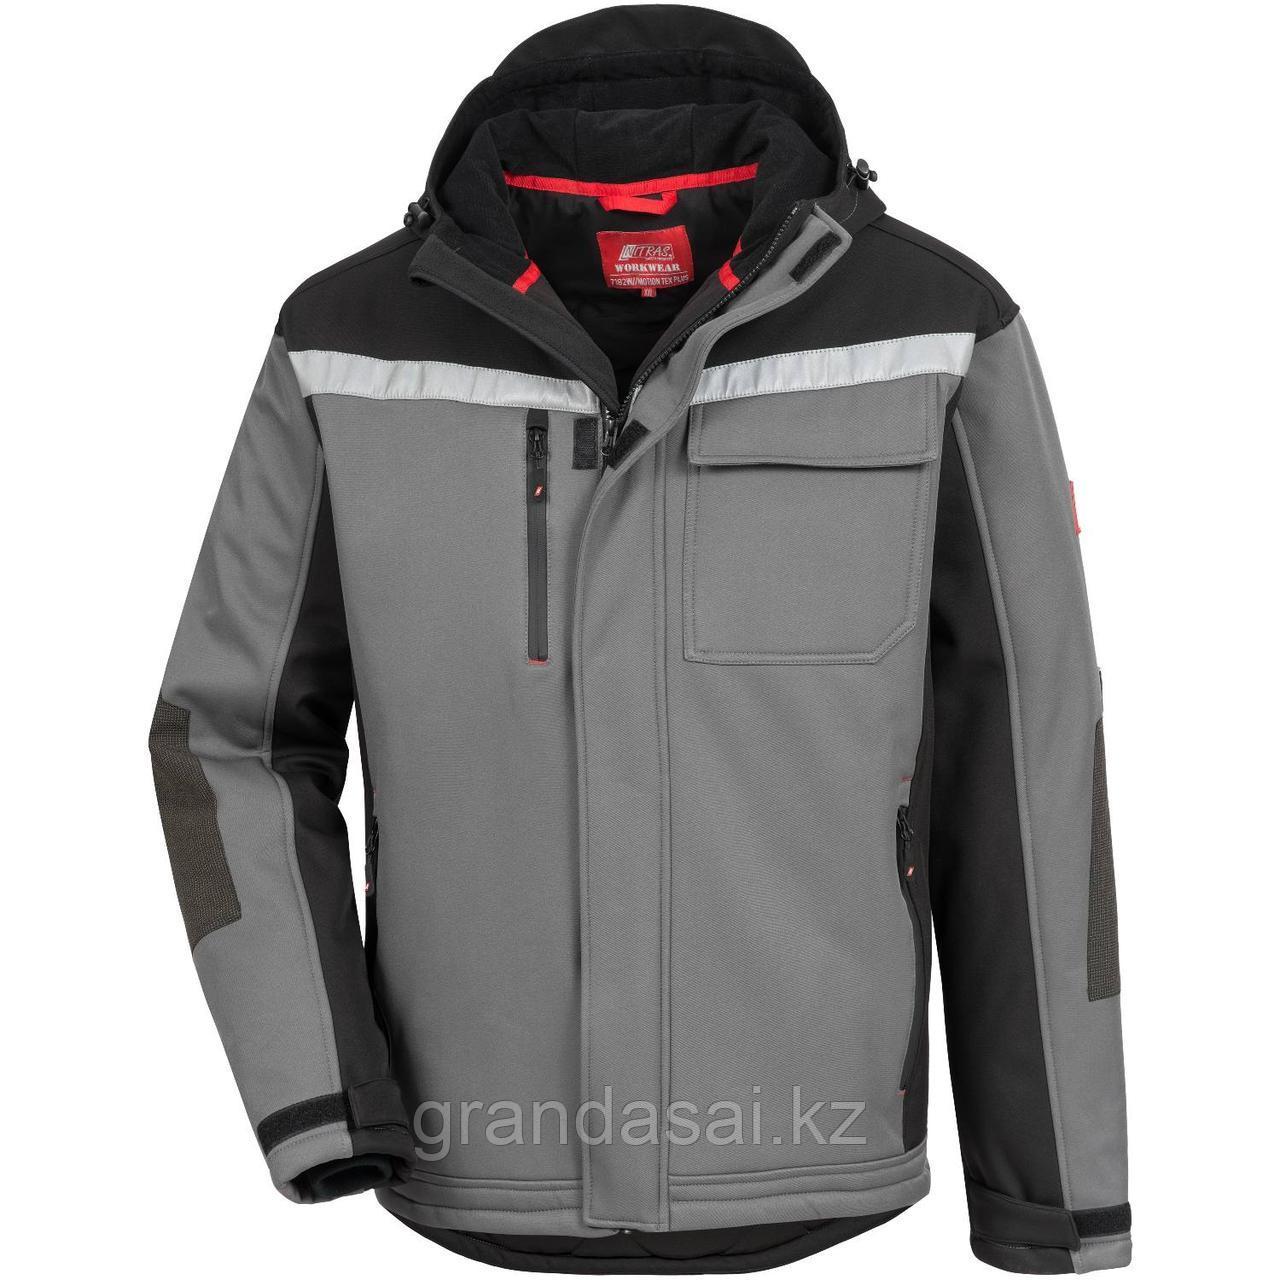 Рабочая зимняя куртка NITRAS 7182W MOTION TEX PLUS